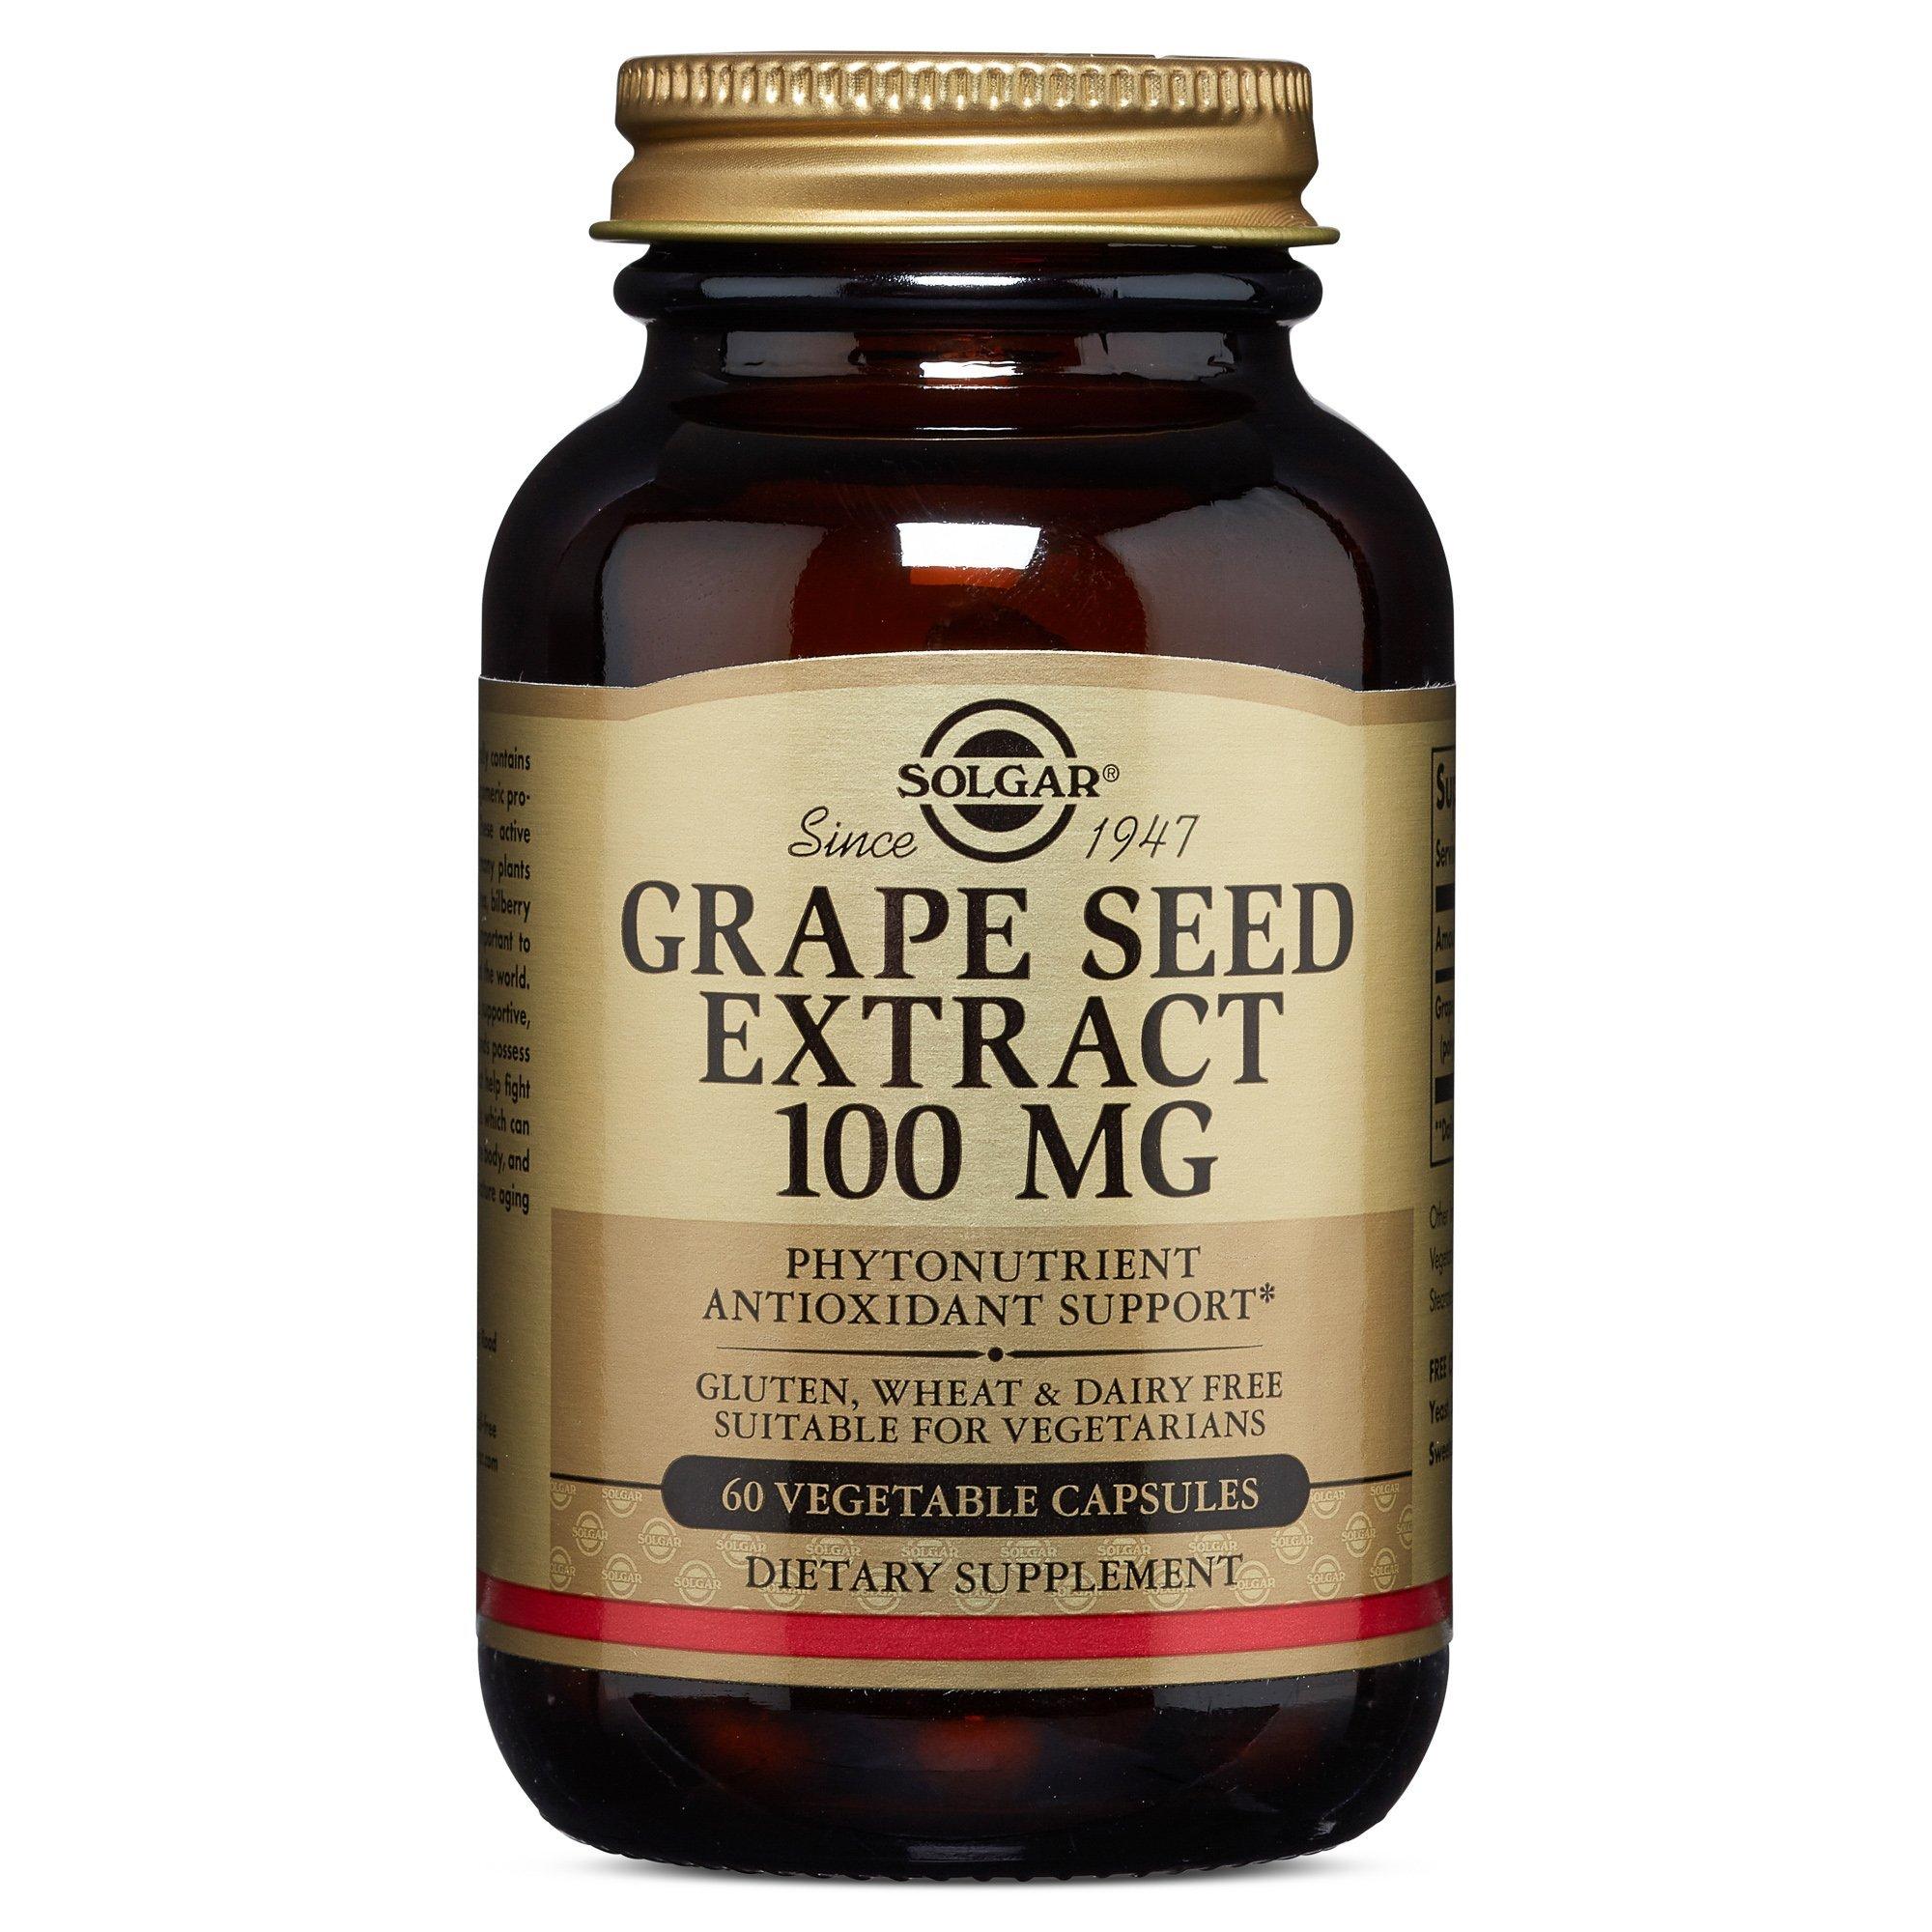 Solgar – Grape Seed Extract, 100 mg, 60 Vegetable Capsules